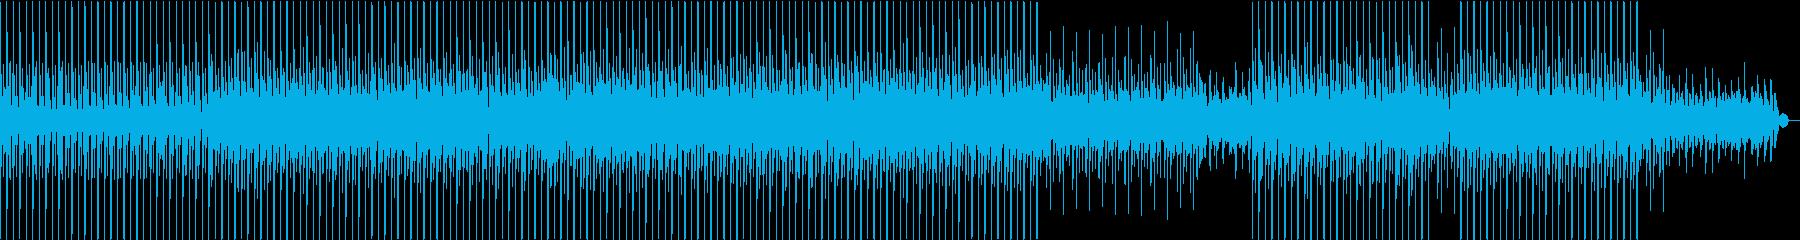 Zen Questionの再生済みの波形